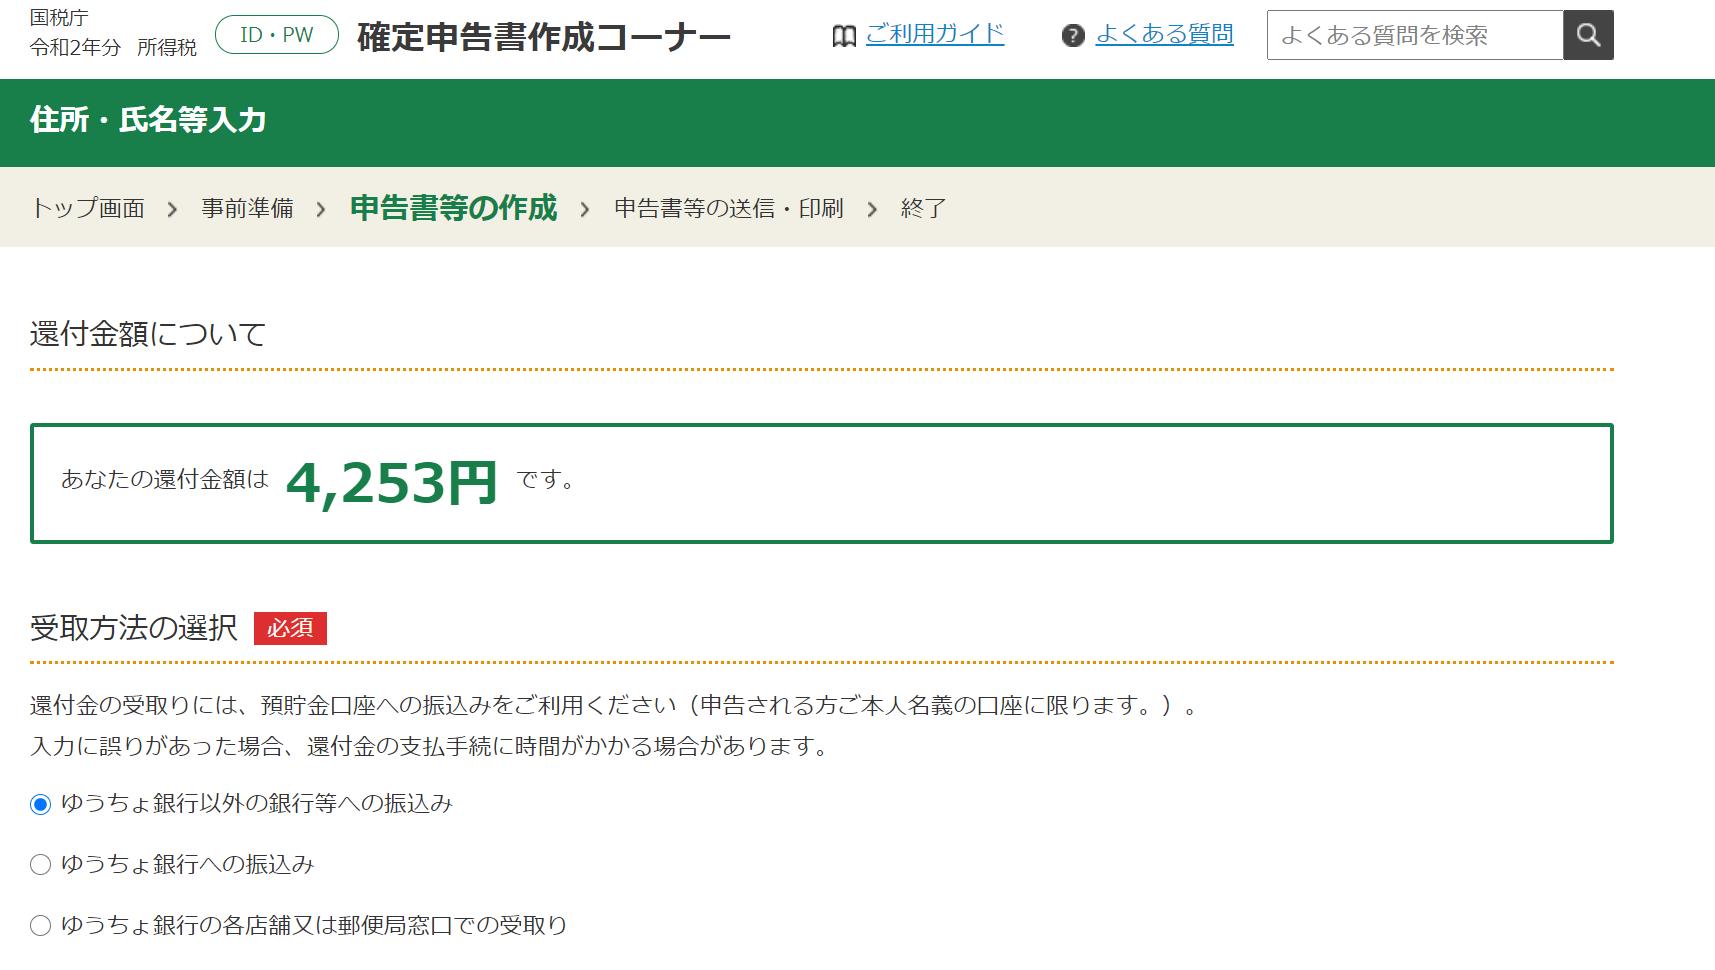 f:id:hodo-work:20210313102200p:plain